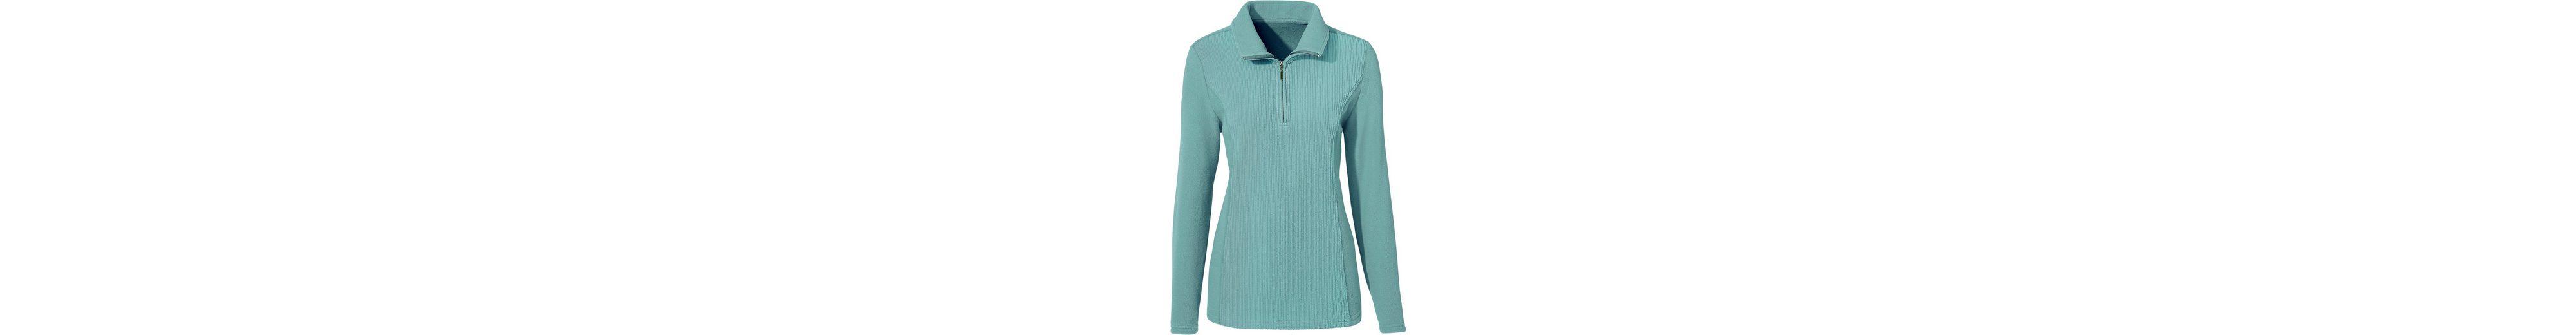 Neueste Online Billige Echte Classic Basics Fleece-Shirt mit Ripp-Optik E9Vgyo